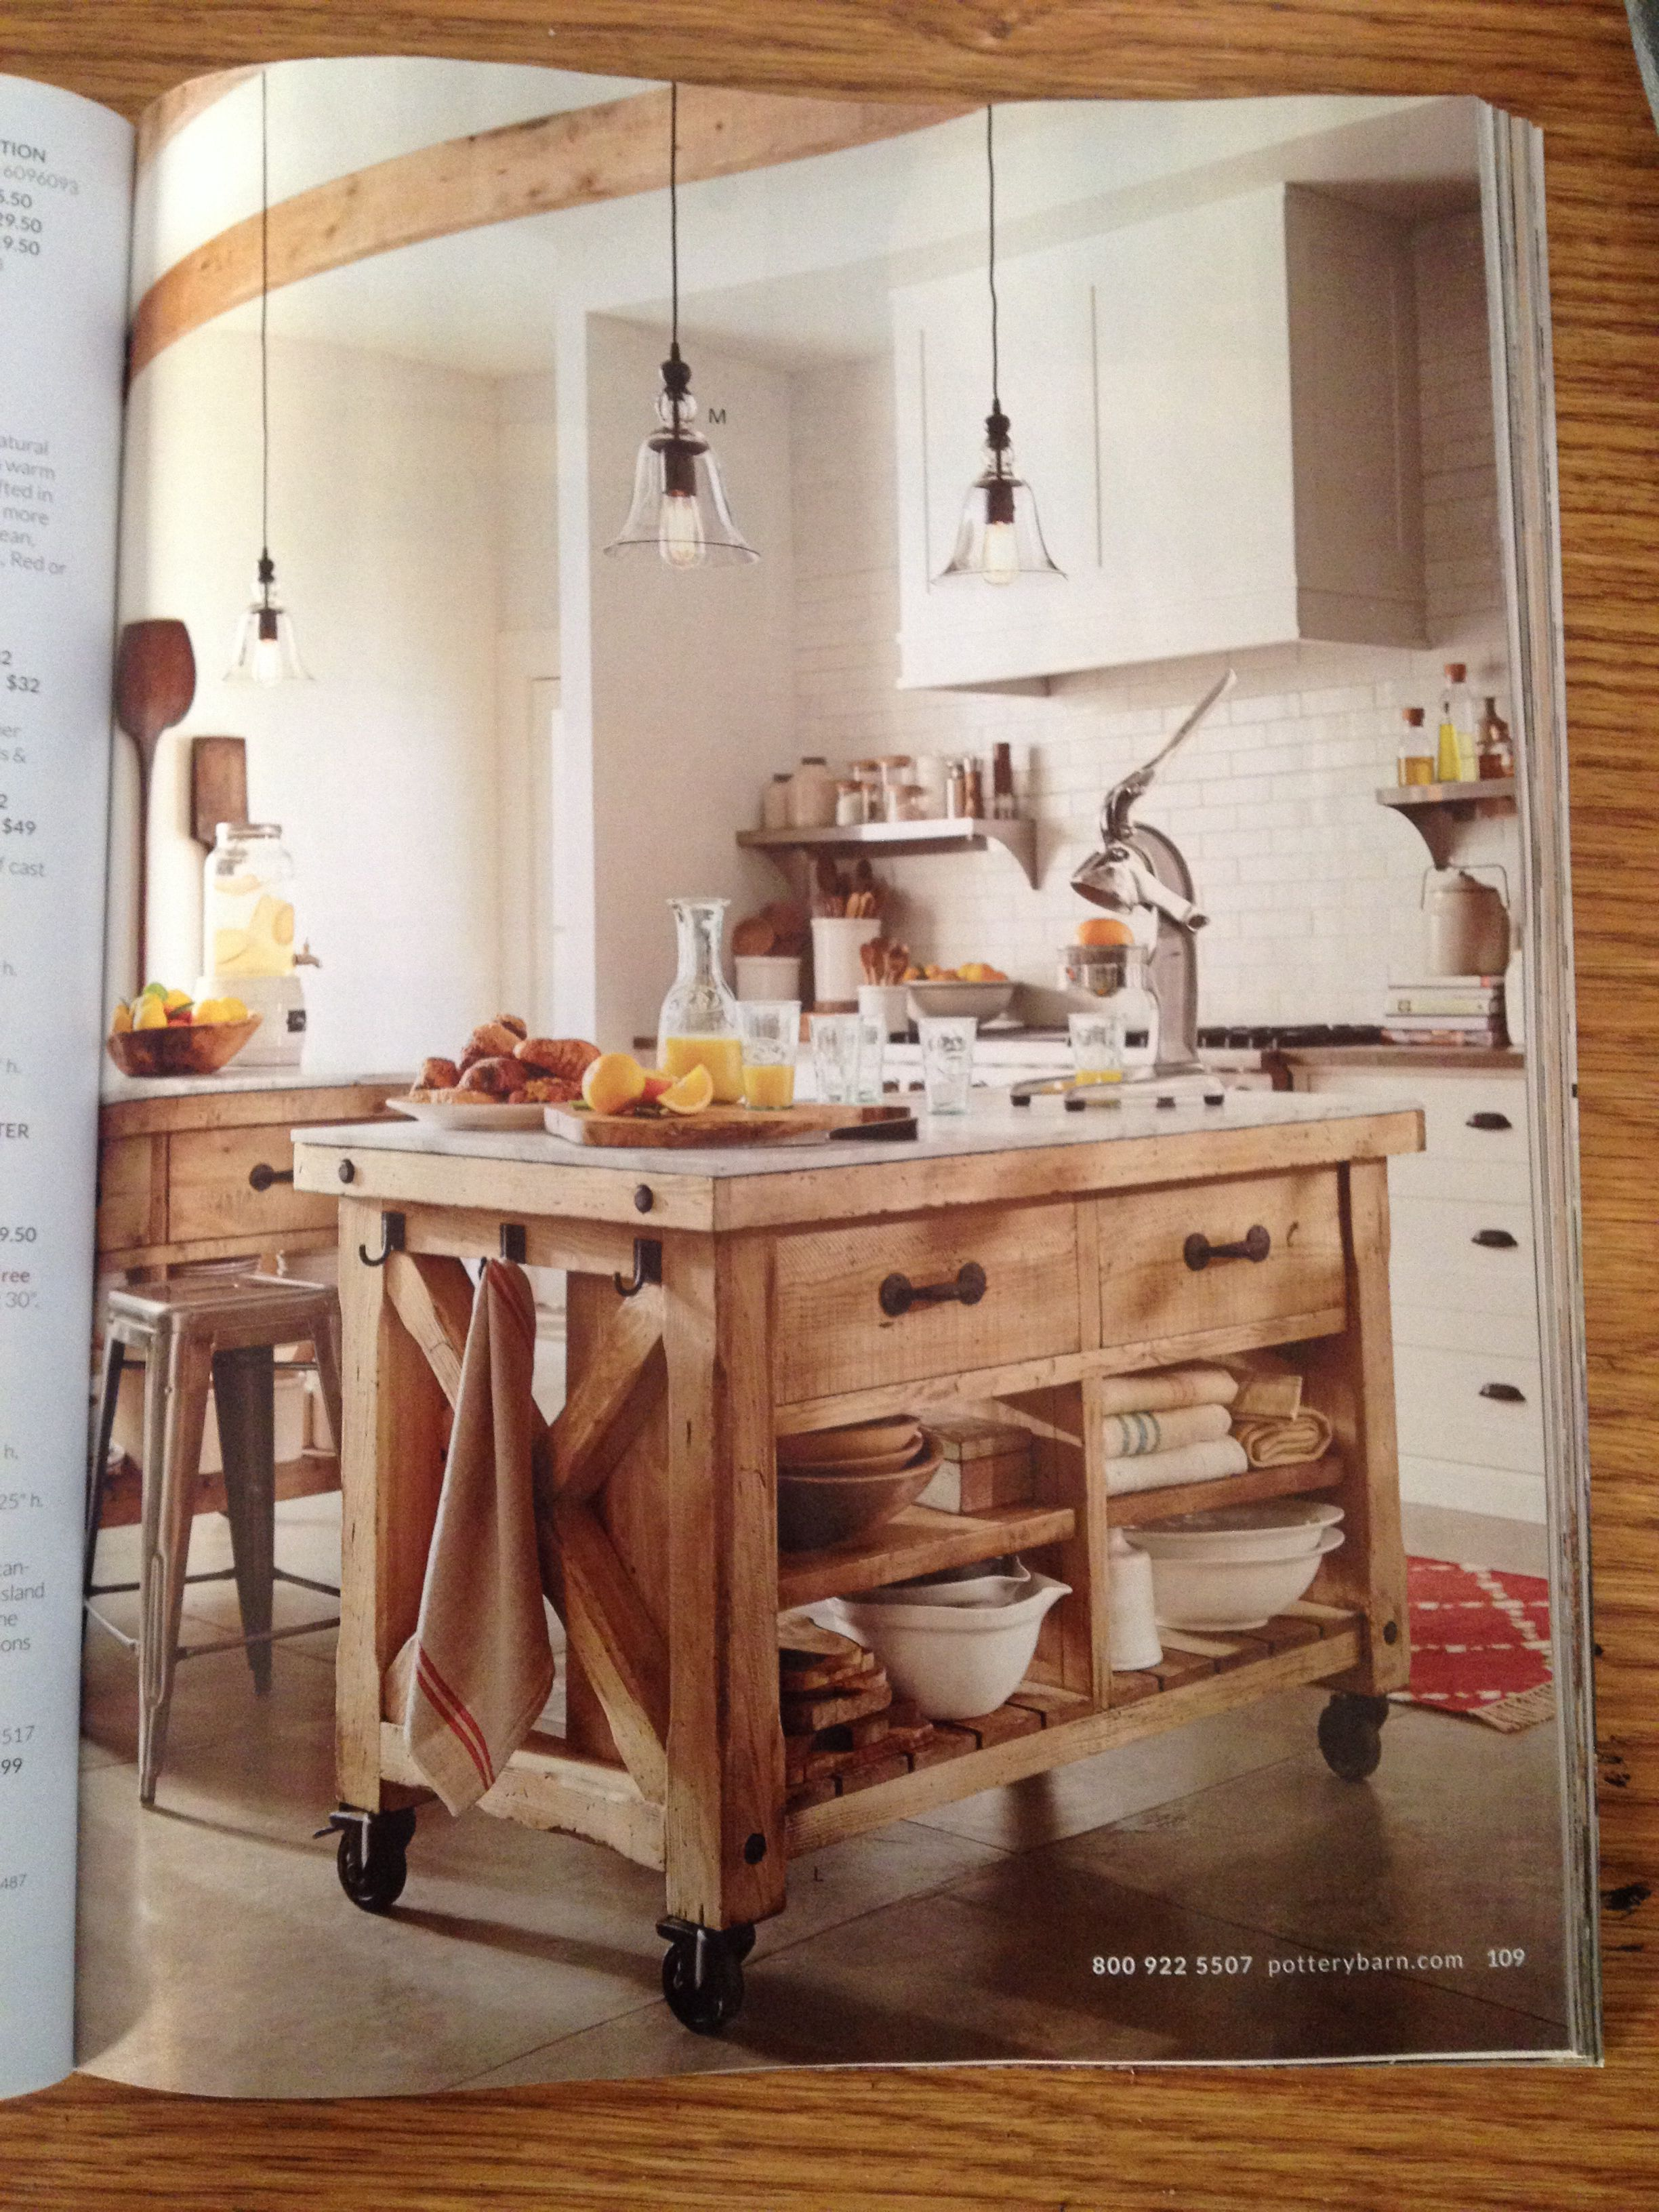 Pottery barn kitchen island home ideas pinterest for Barn kitchen ideas